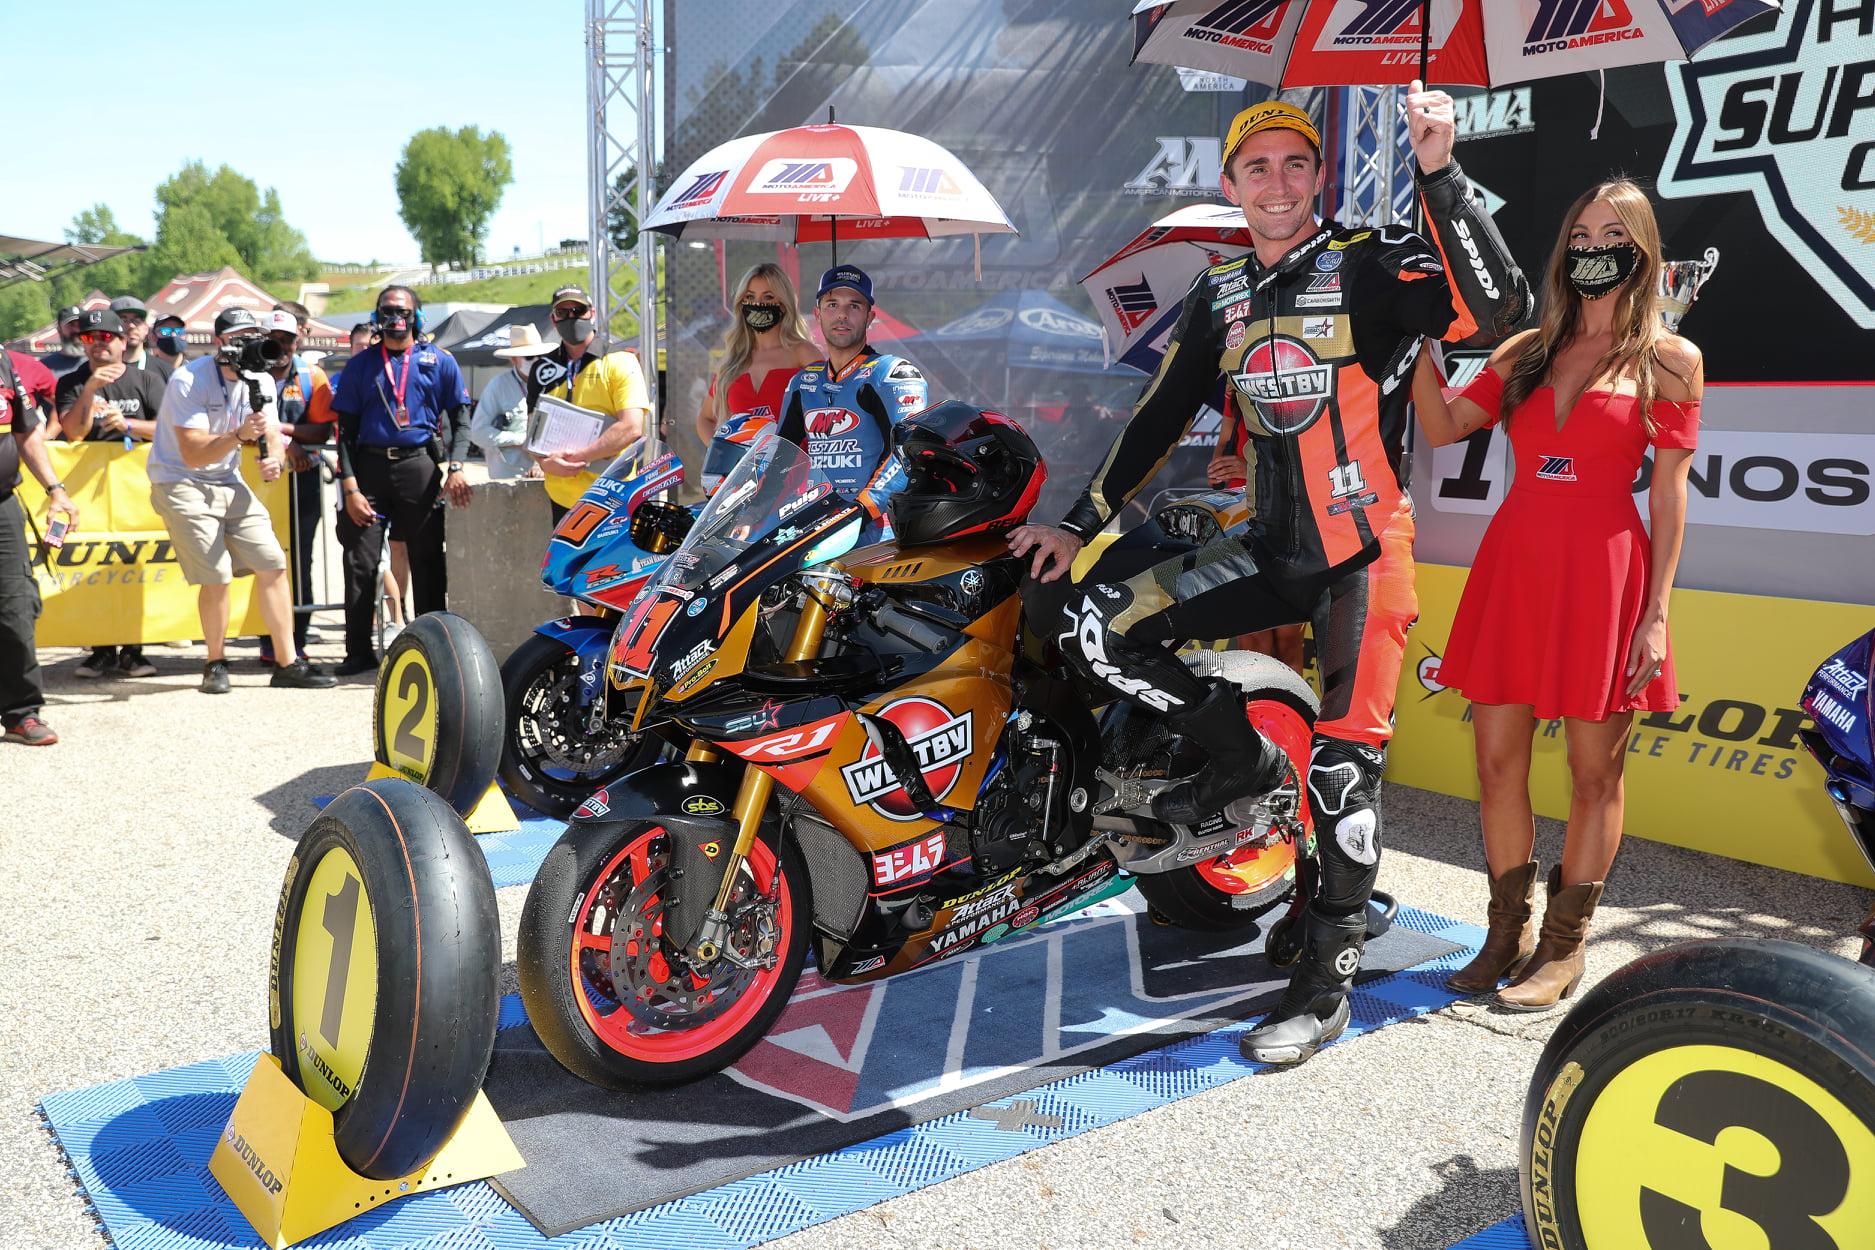 Scholtz Strikes Gold, Wins Saturday's Superbike Race At Michelin Raceway Road Atlanta; Roach Finishe